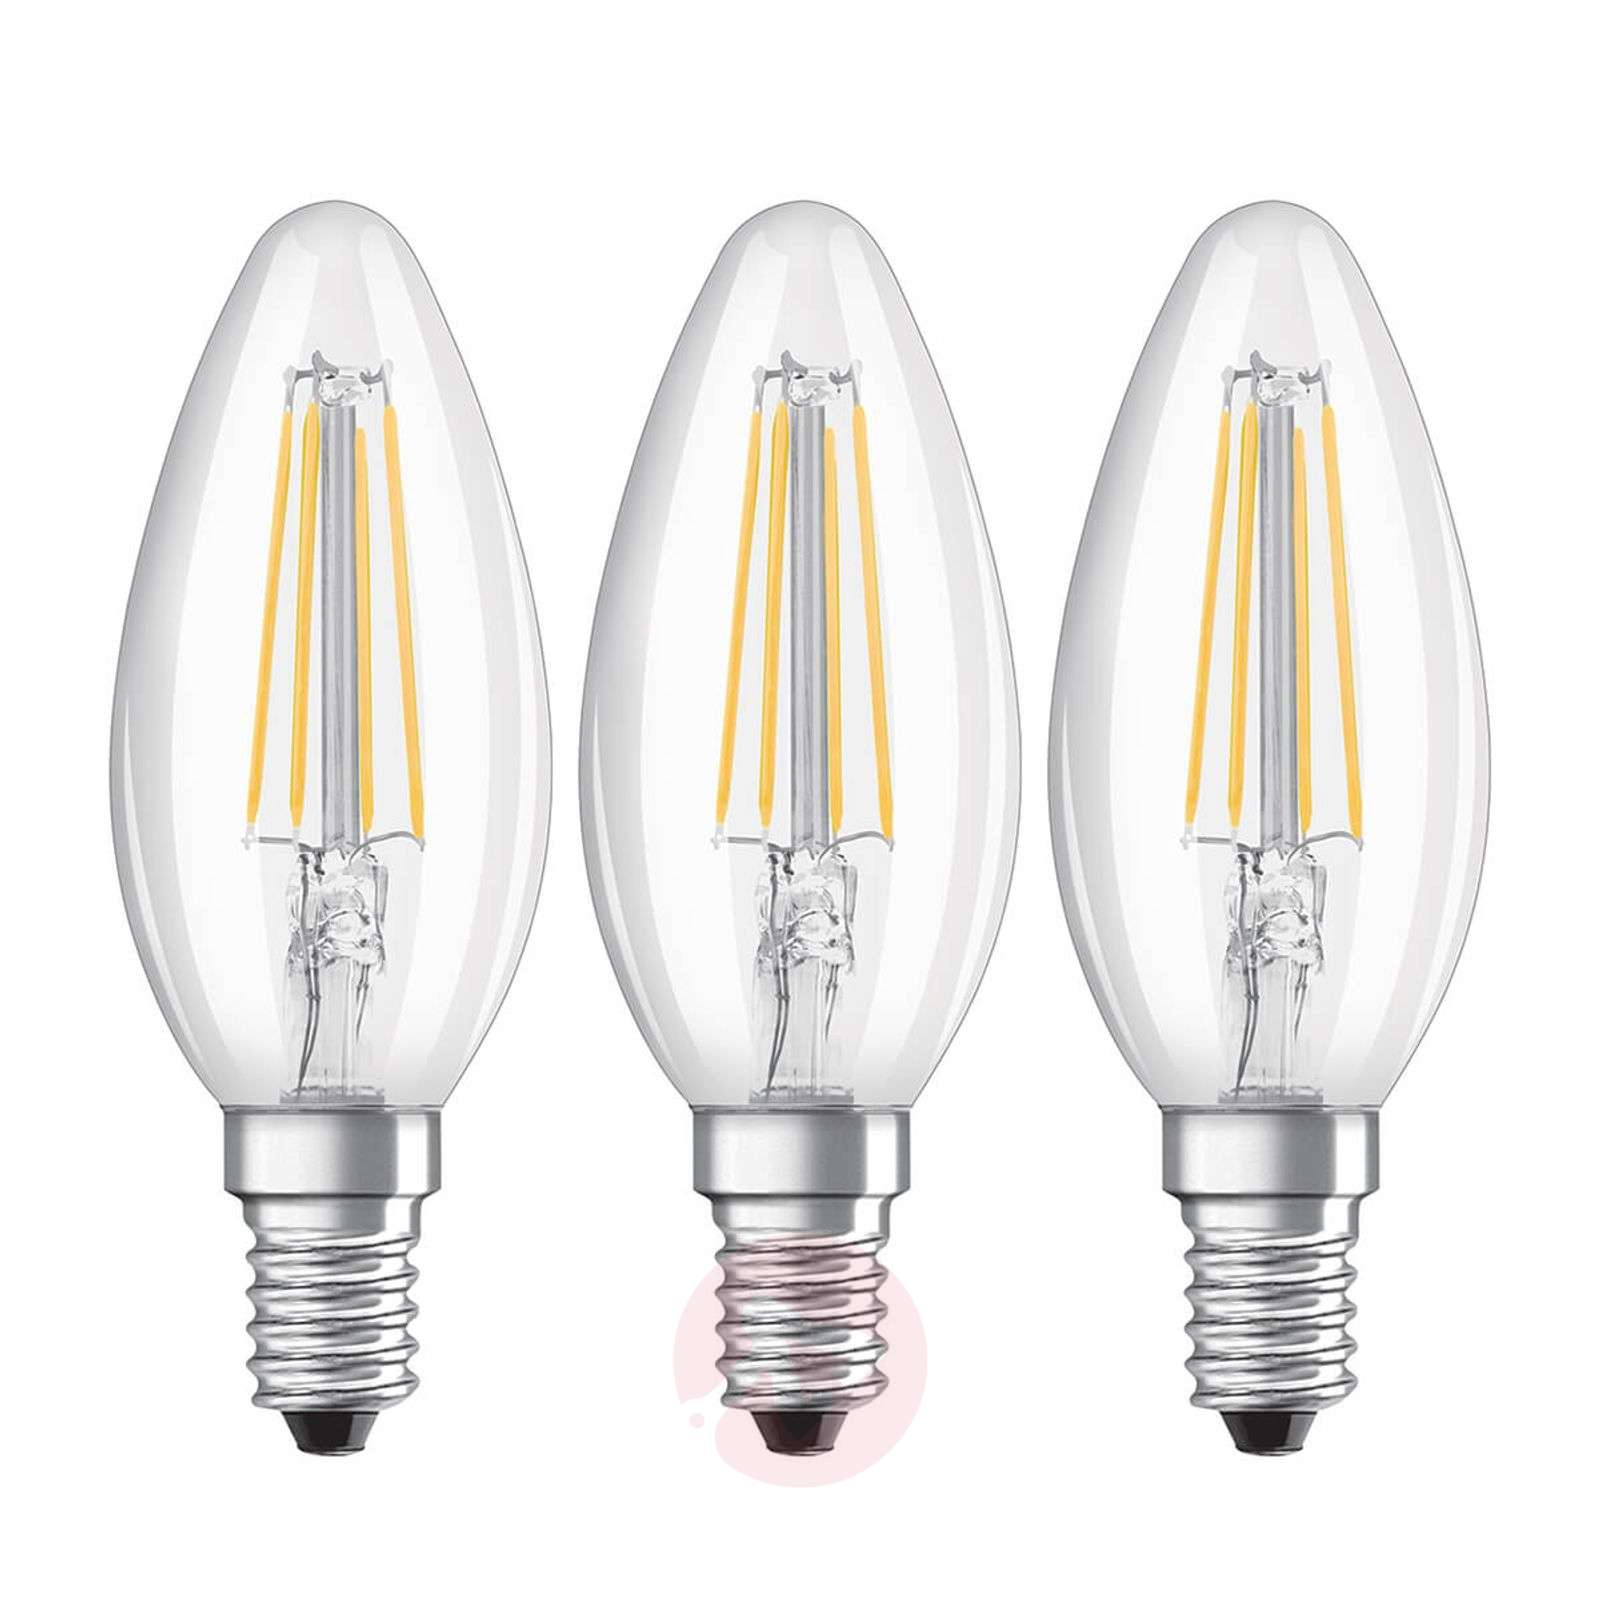 LED-hehkulankalamppu E14 4 W, lämmin valk., 3 kpl-7262098-01